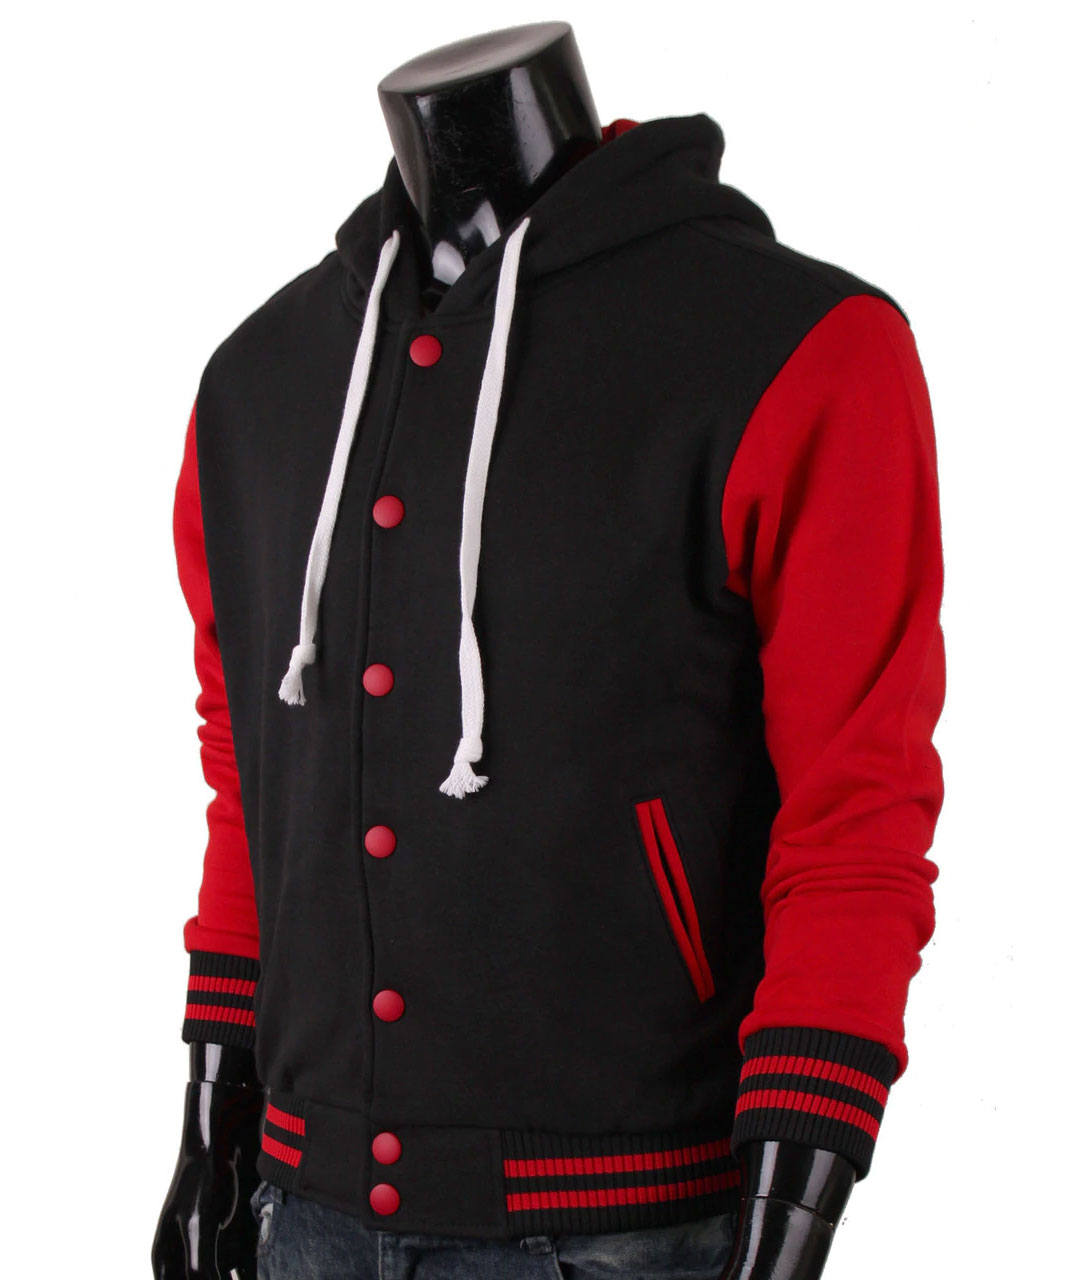 Men's Jacket Hoodie Baseball Jacket Varsity Letterman Jacket